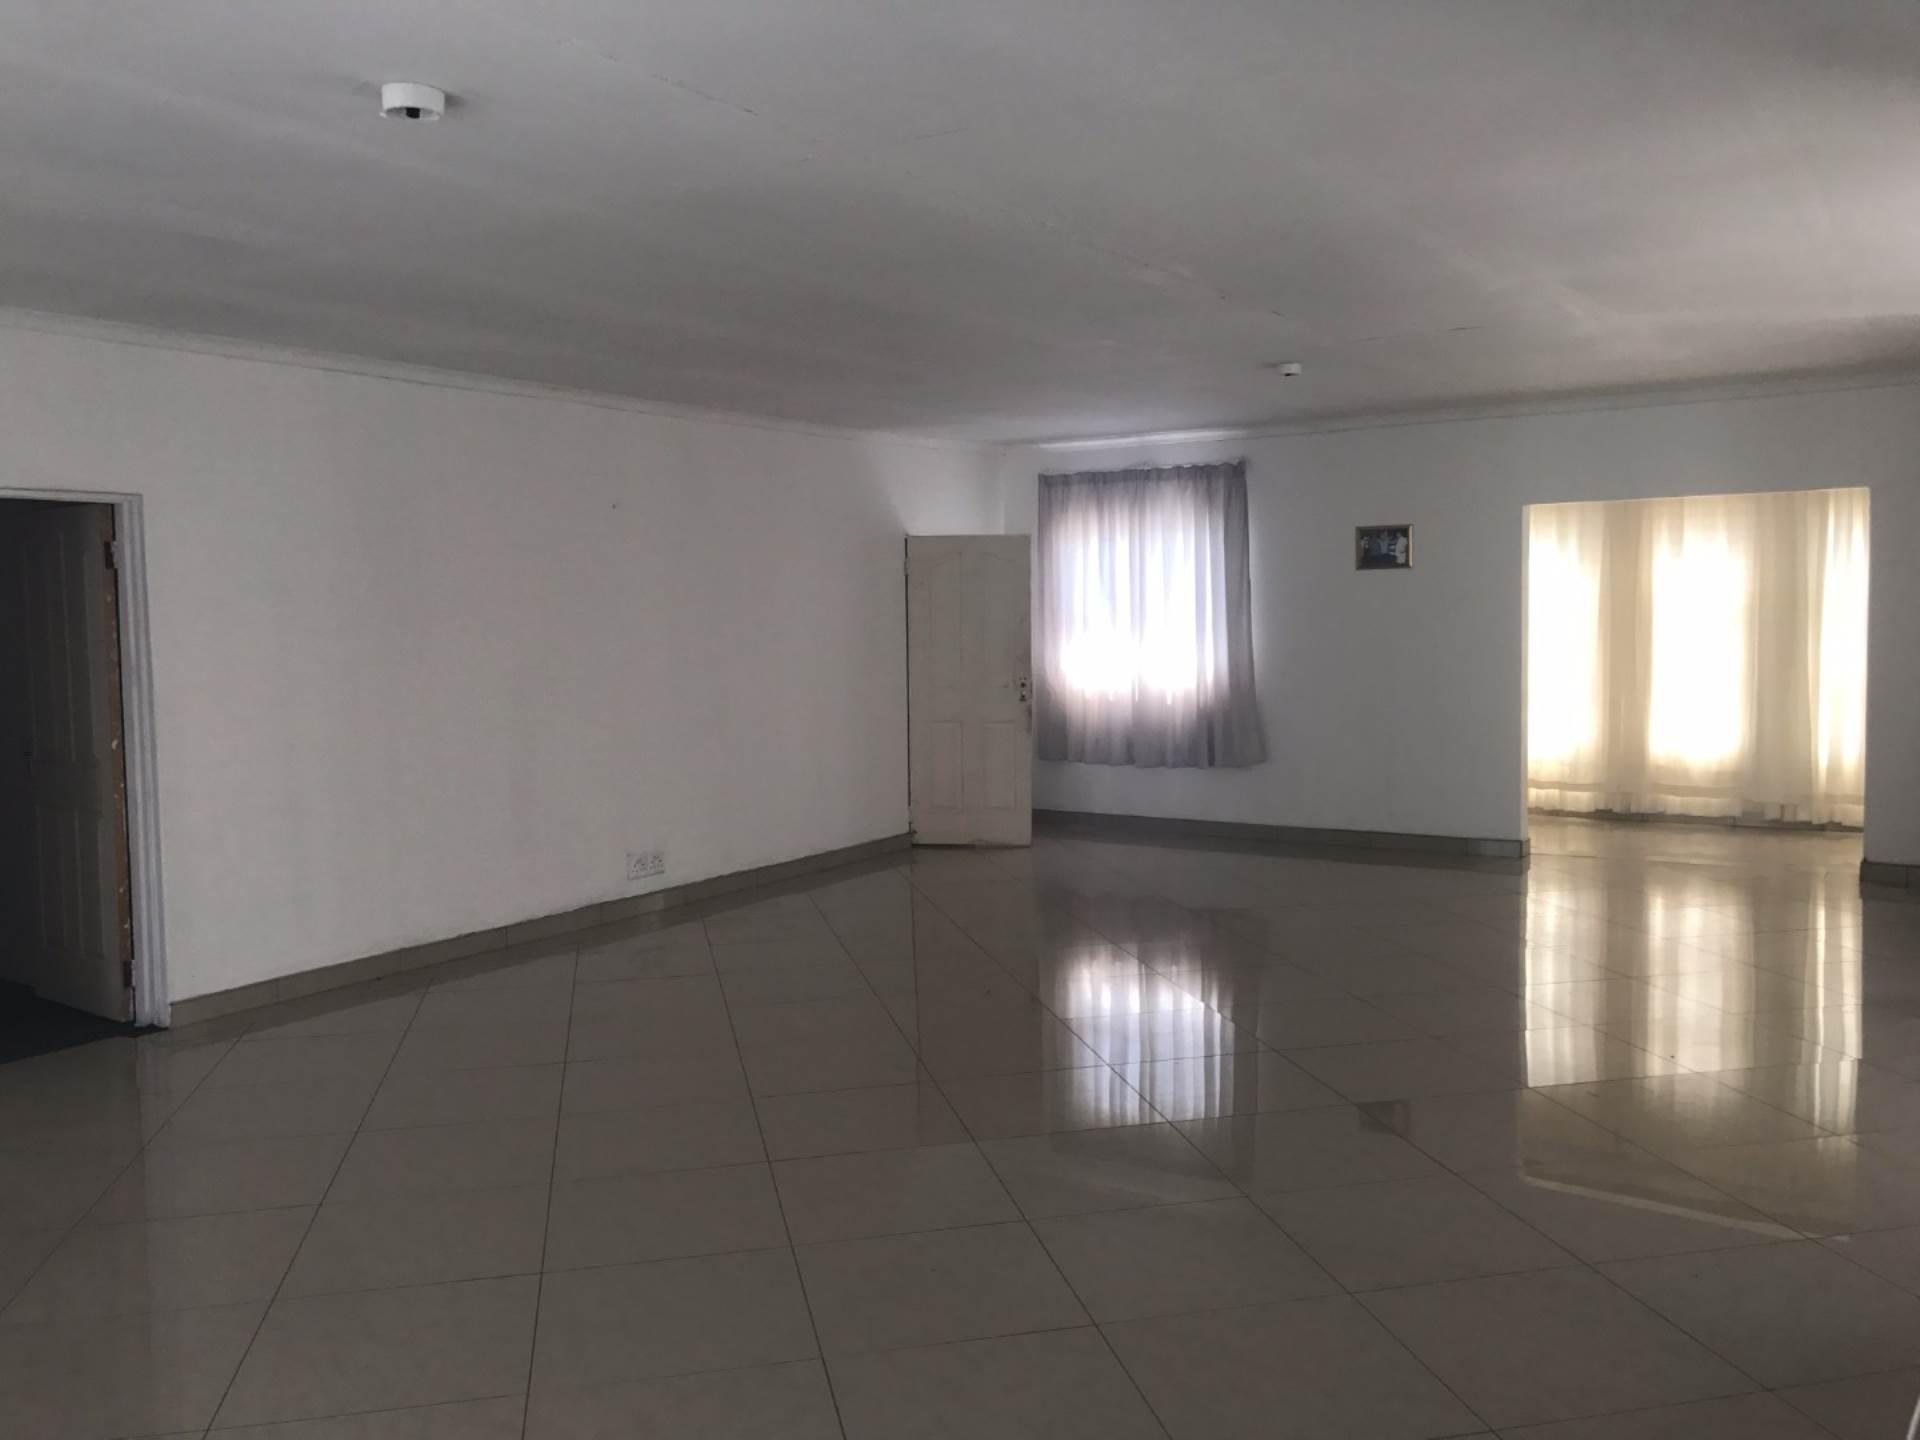 5 BedroomHouse To Rent In Birdswood